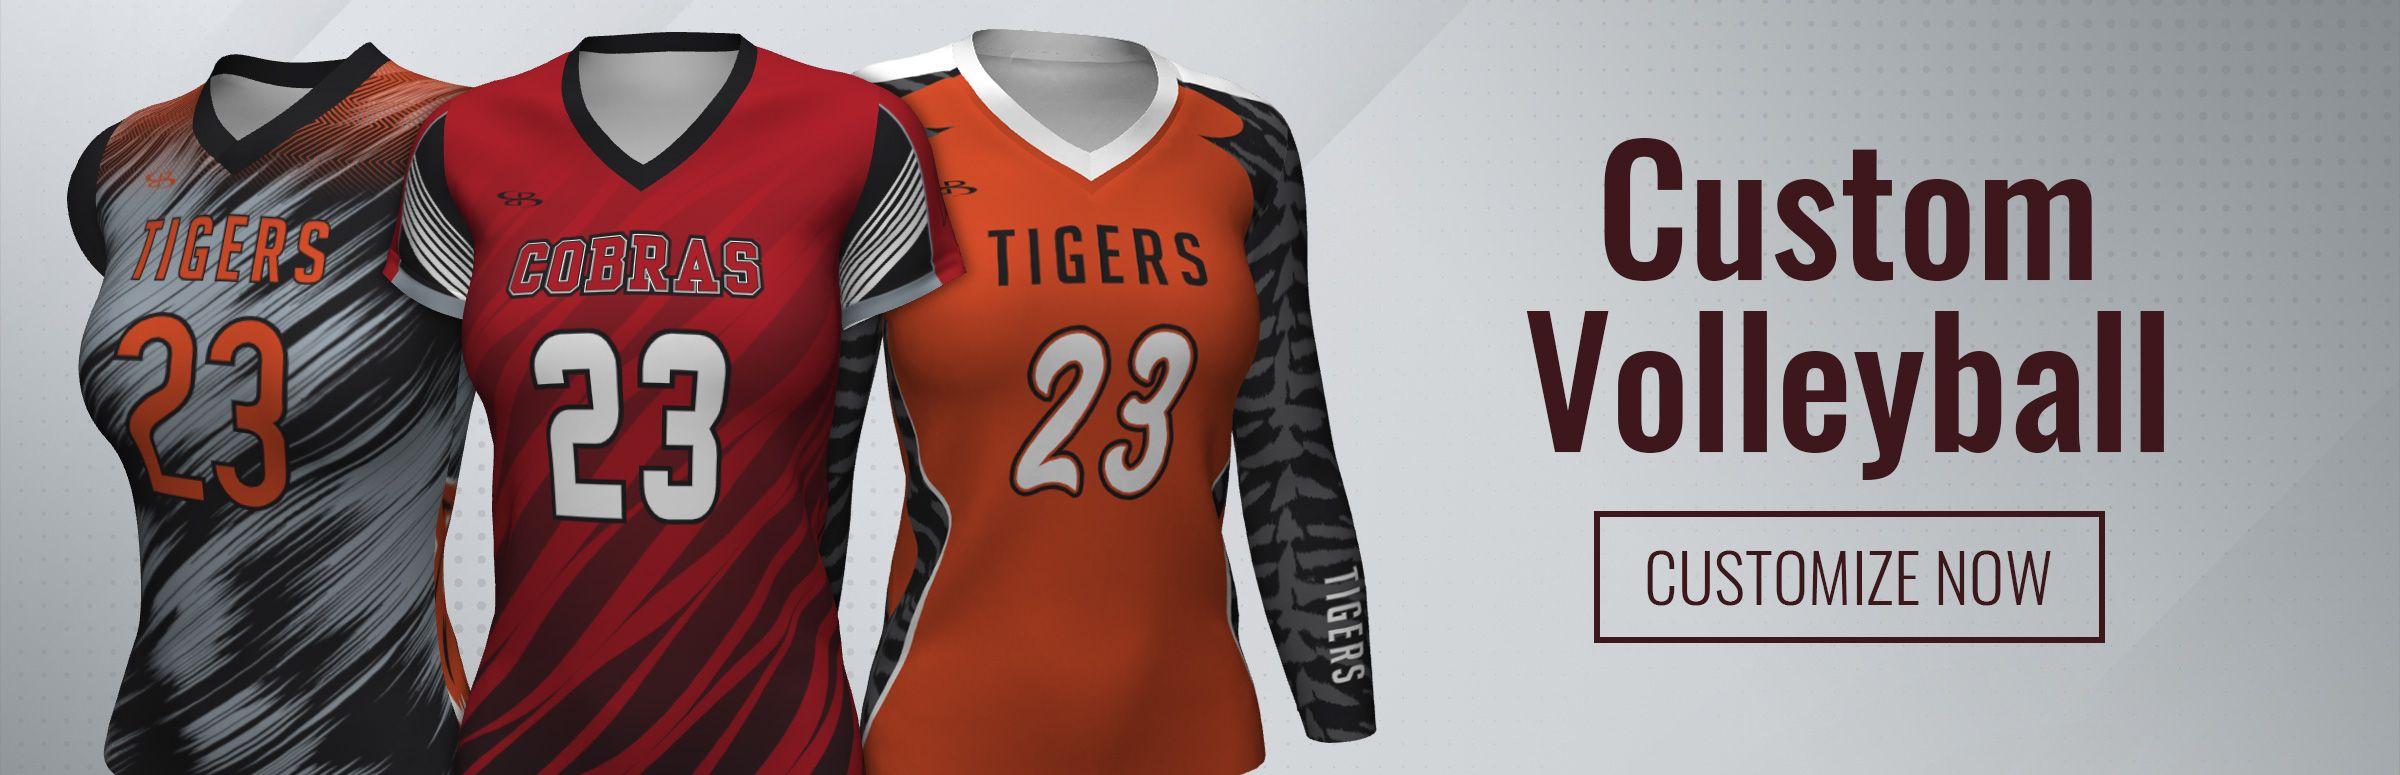 Custom Volleyball Uniforms